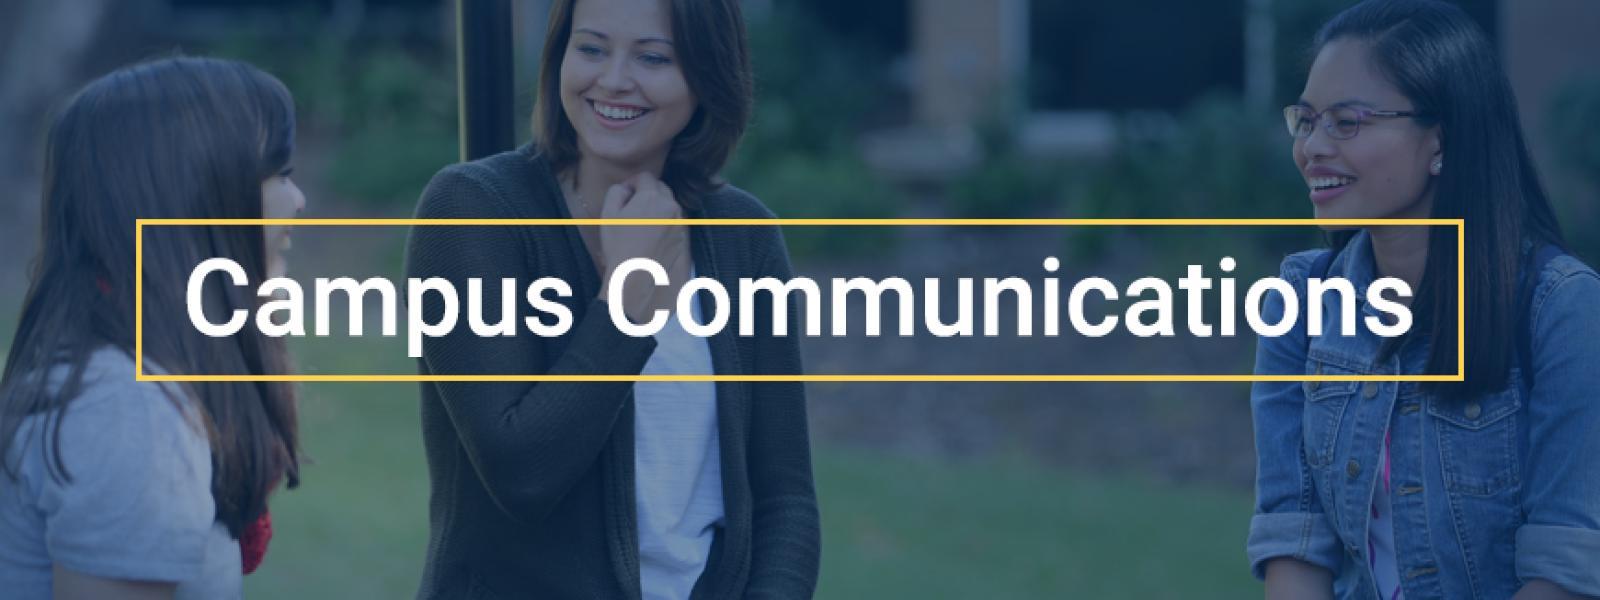 Campus Communications